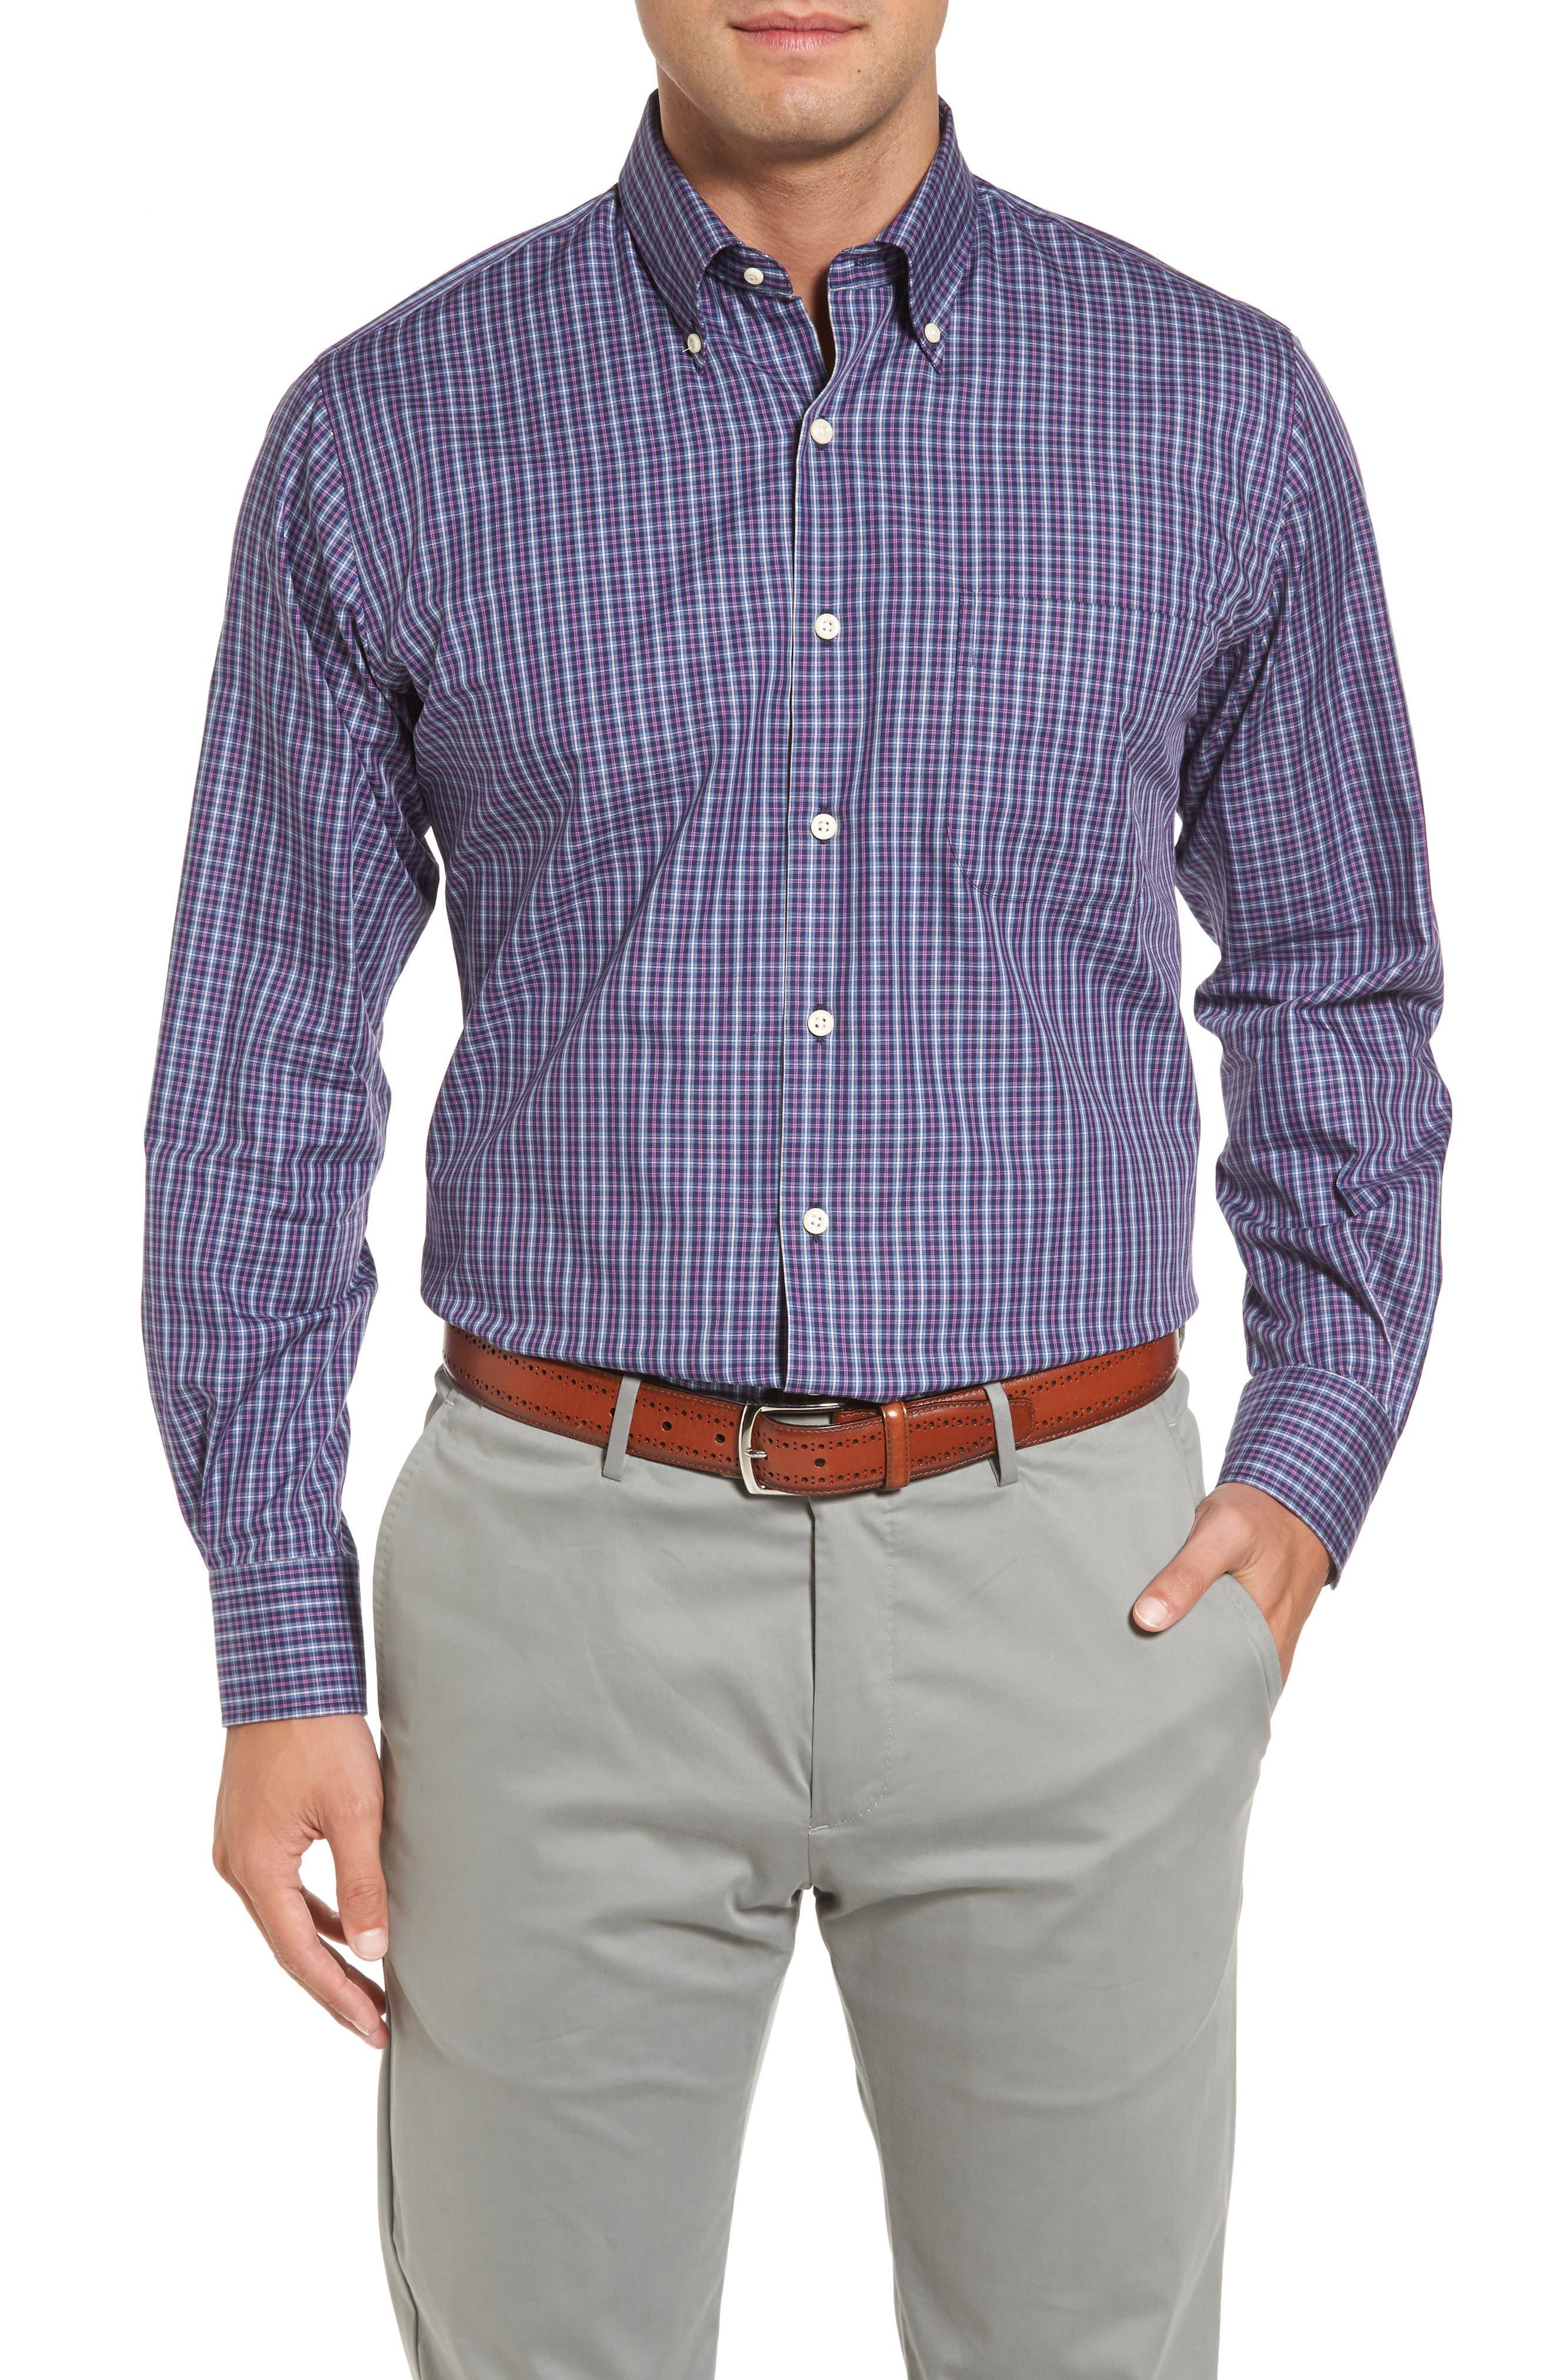 Hillock Regular Fit Plaid Sport Shirt,                         Main,                         color,